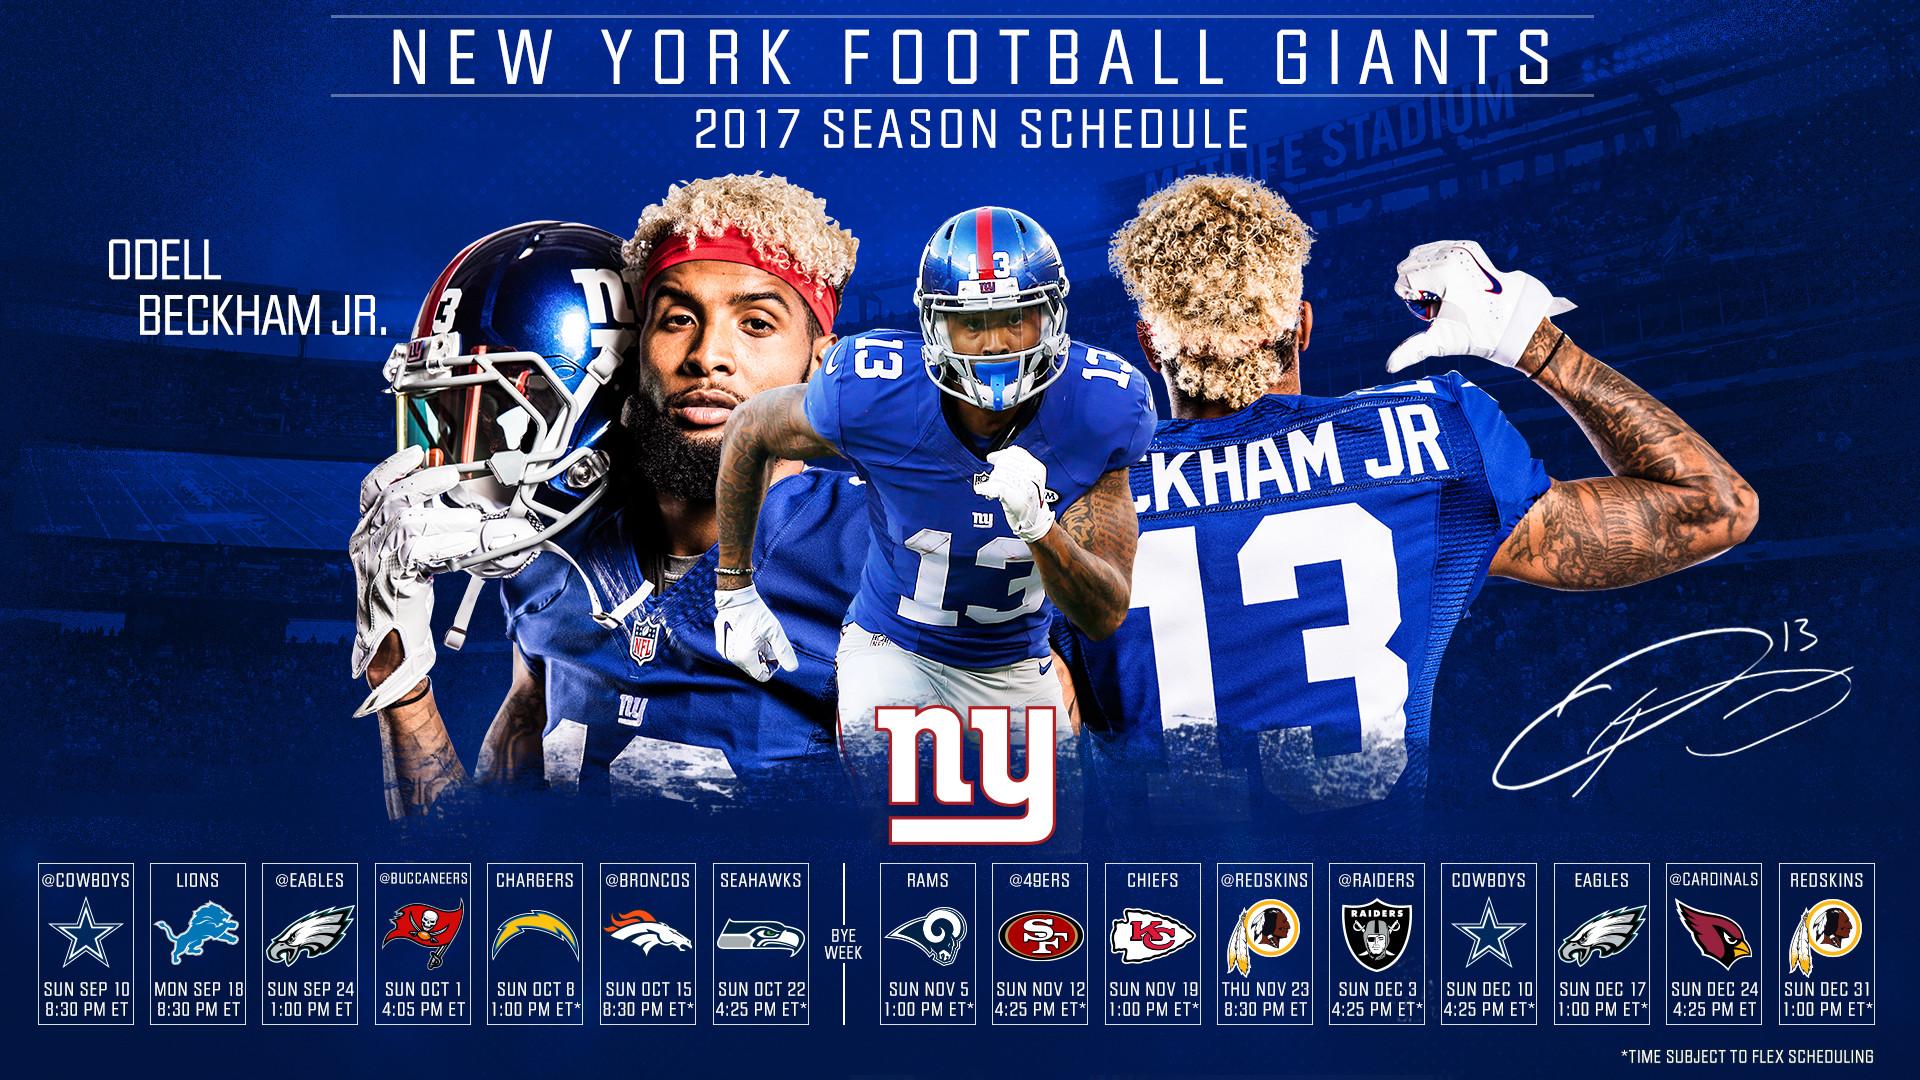 Tom Brady Wallpaper Iphone 7 Patriots Super Bowl Champions Wallpaper 75 Images